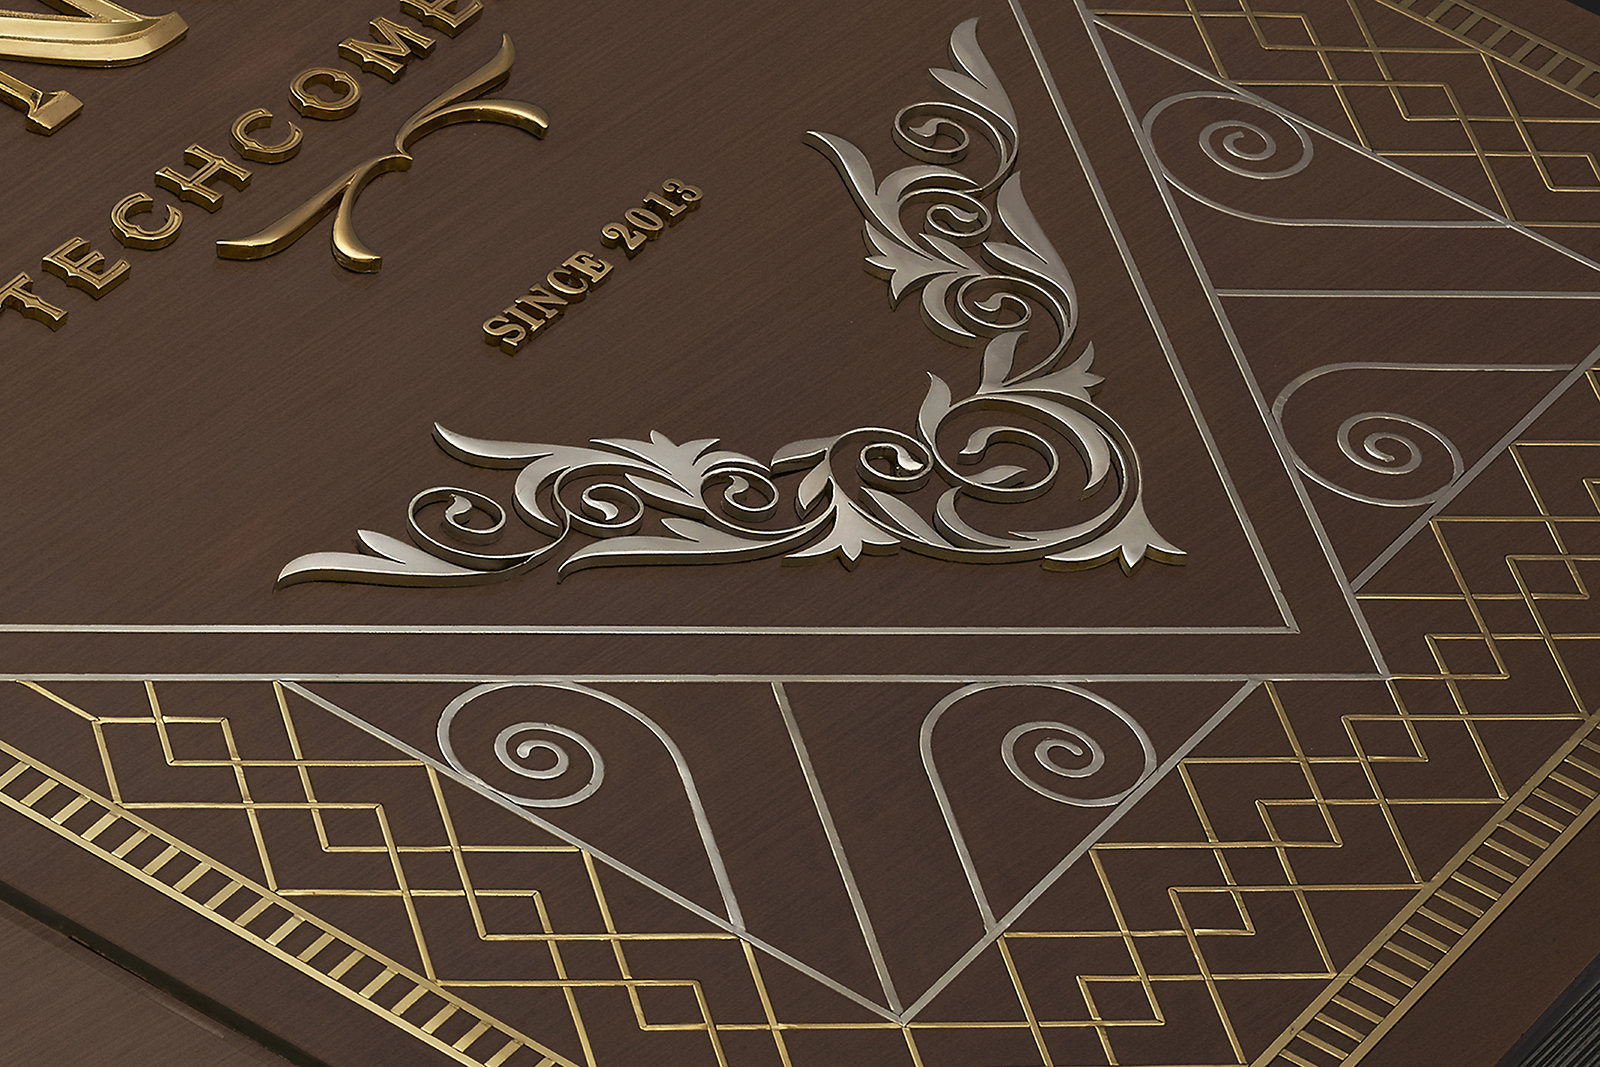 goldbook-detail